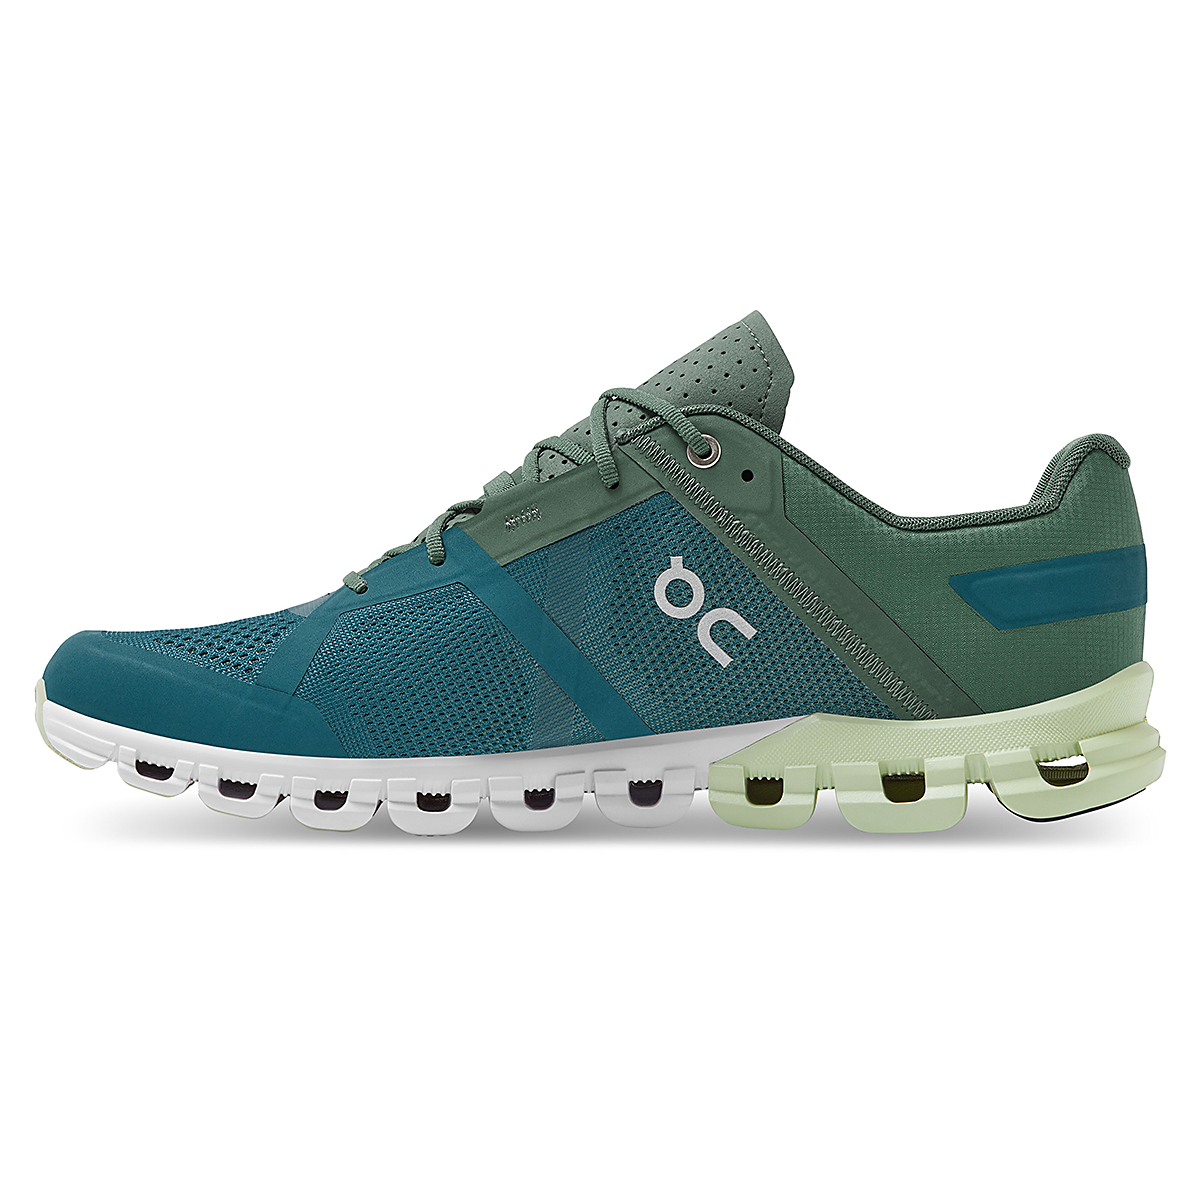 Men's On Cloudflow 2.0 Running Shoe - Color: Sea/Petrol - Size: 7 - Width: Regular, Sea/Petrol, large, image 4